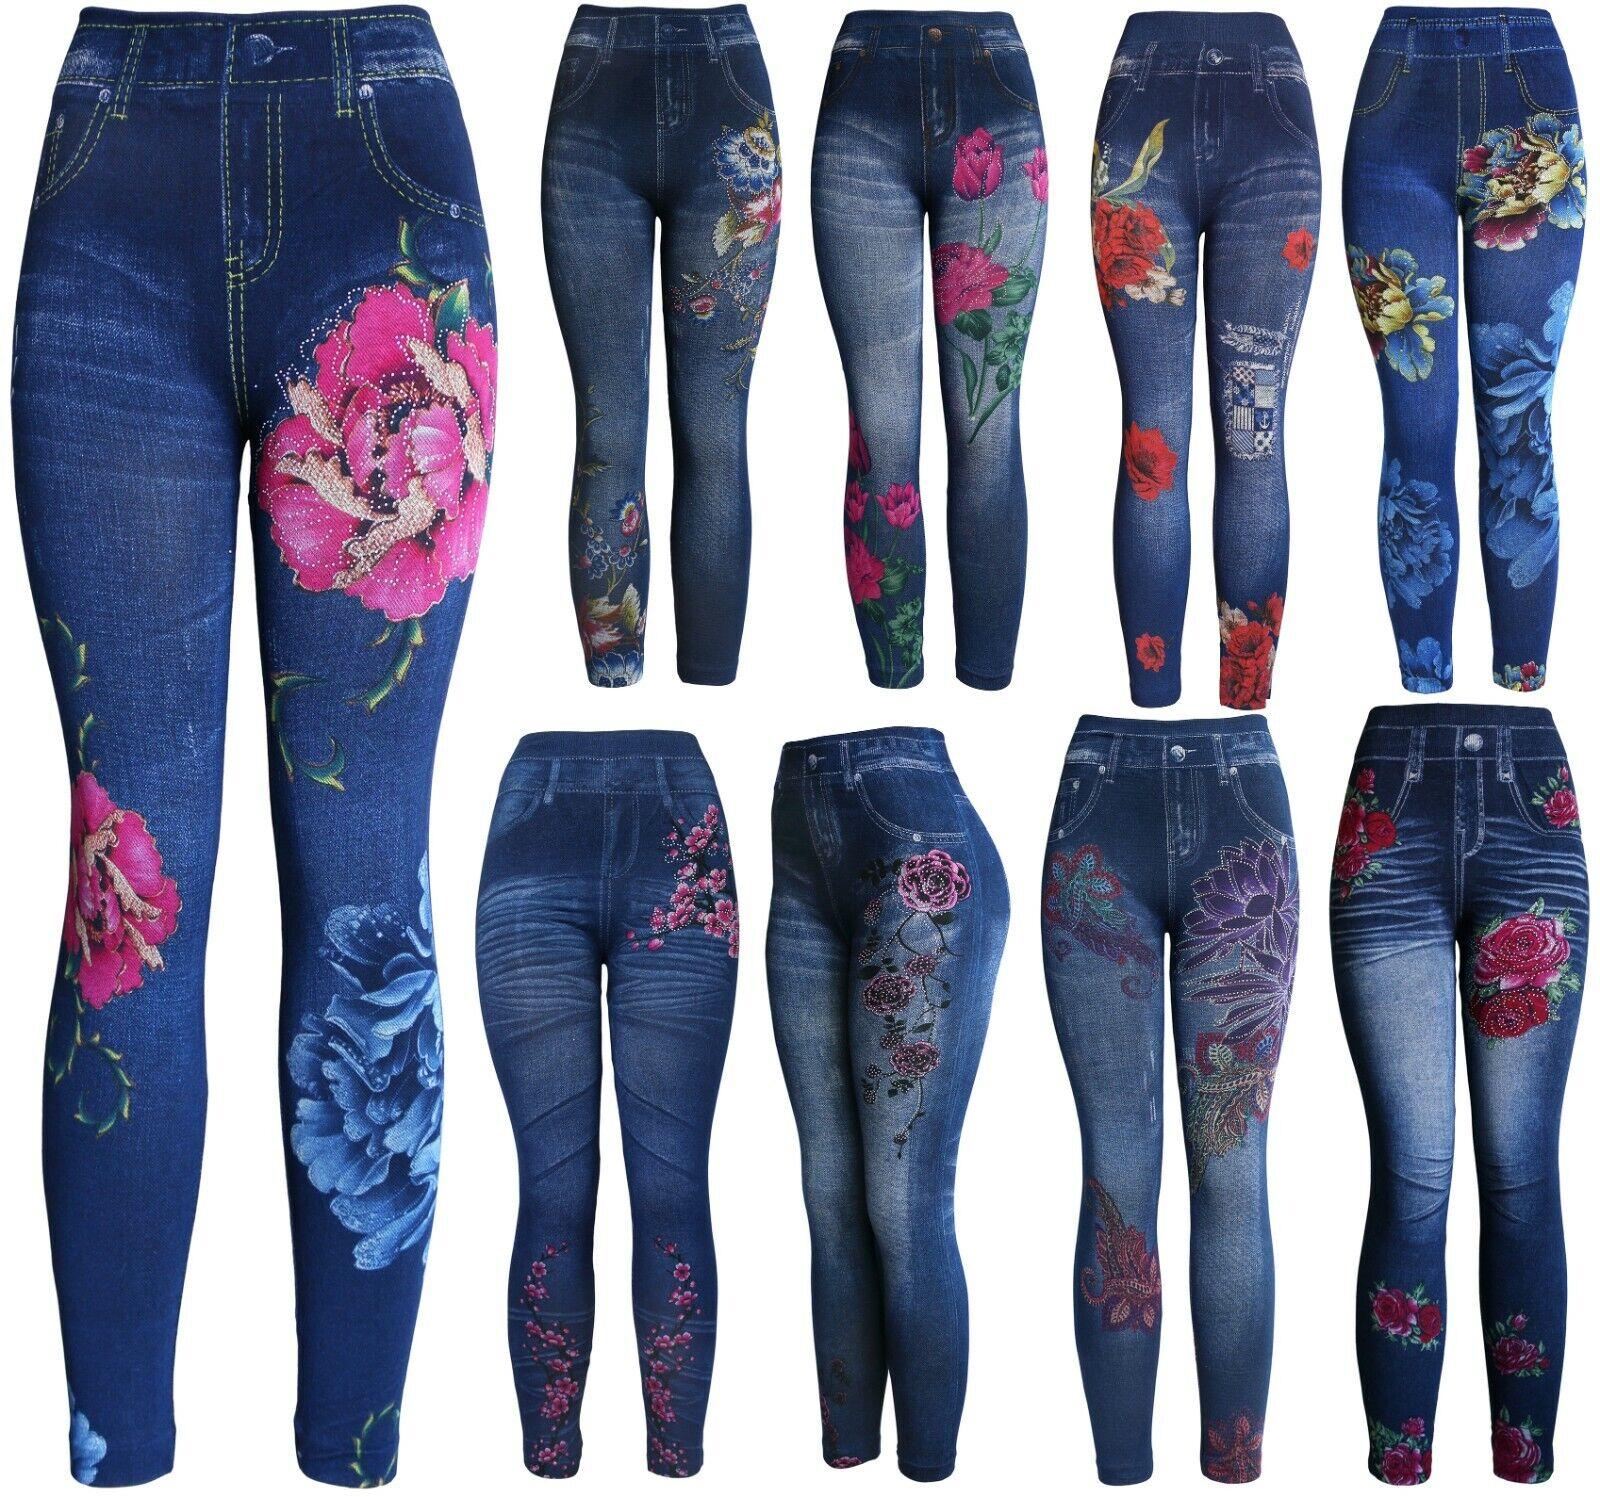 High Waist Women's Denim Print Fake Faux Jeans Leggings Pants Clothing, Shoes & Accessories